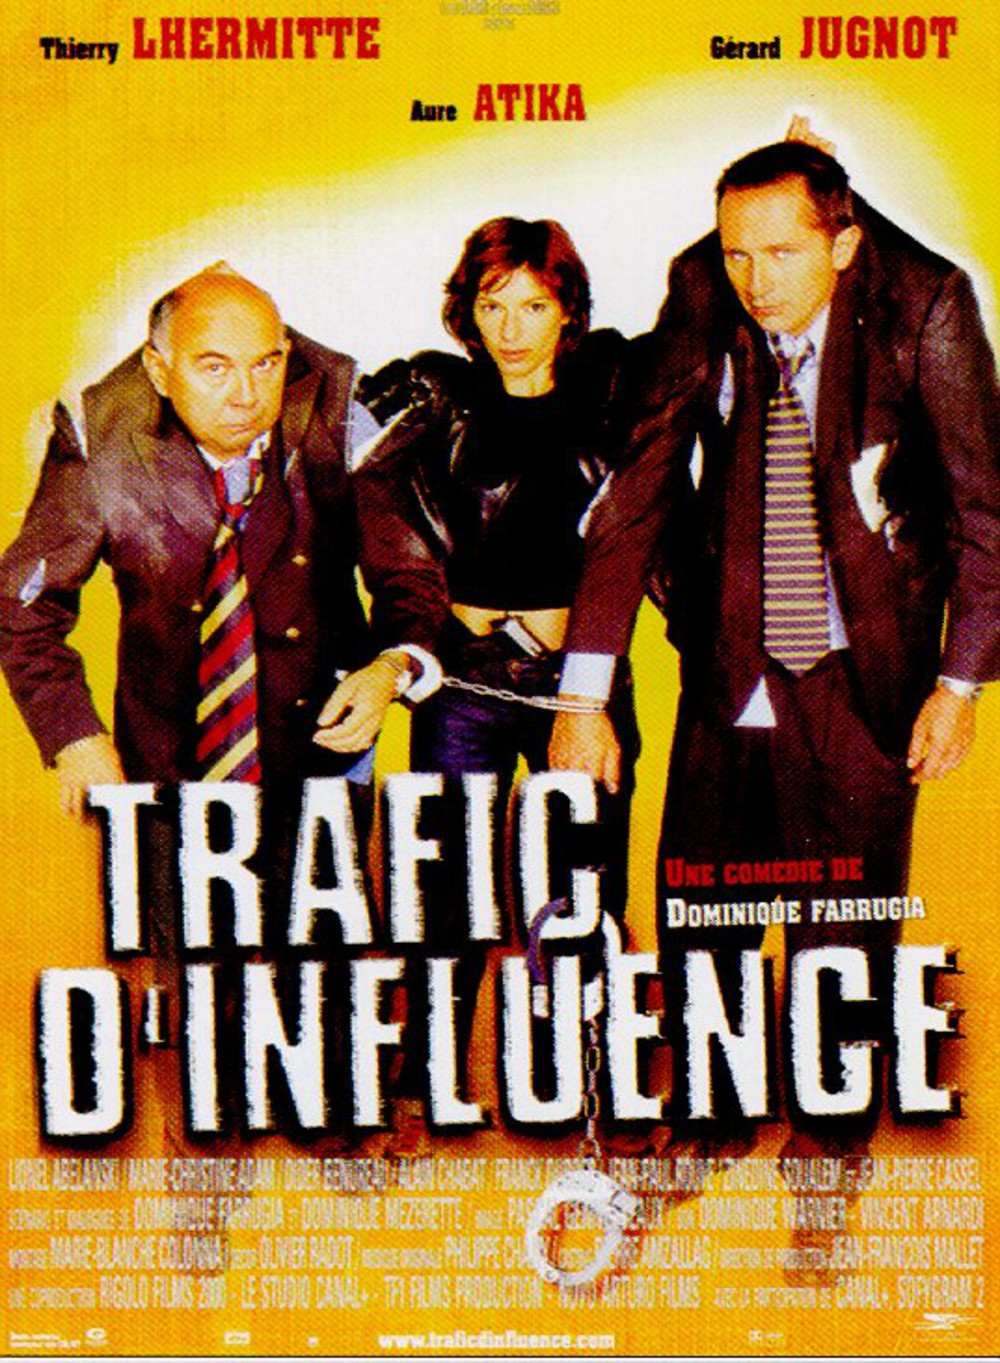 Traffic d'influence